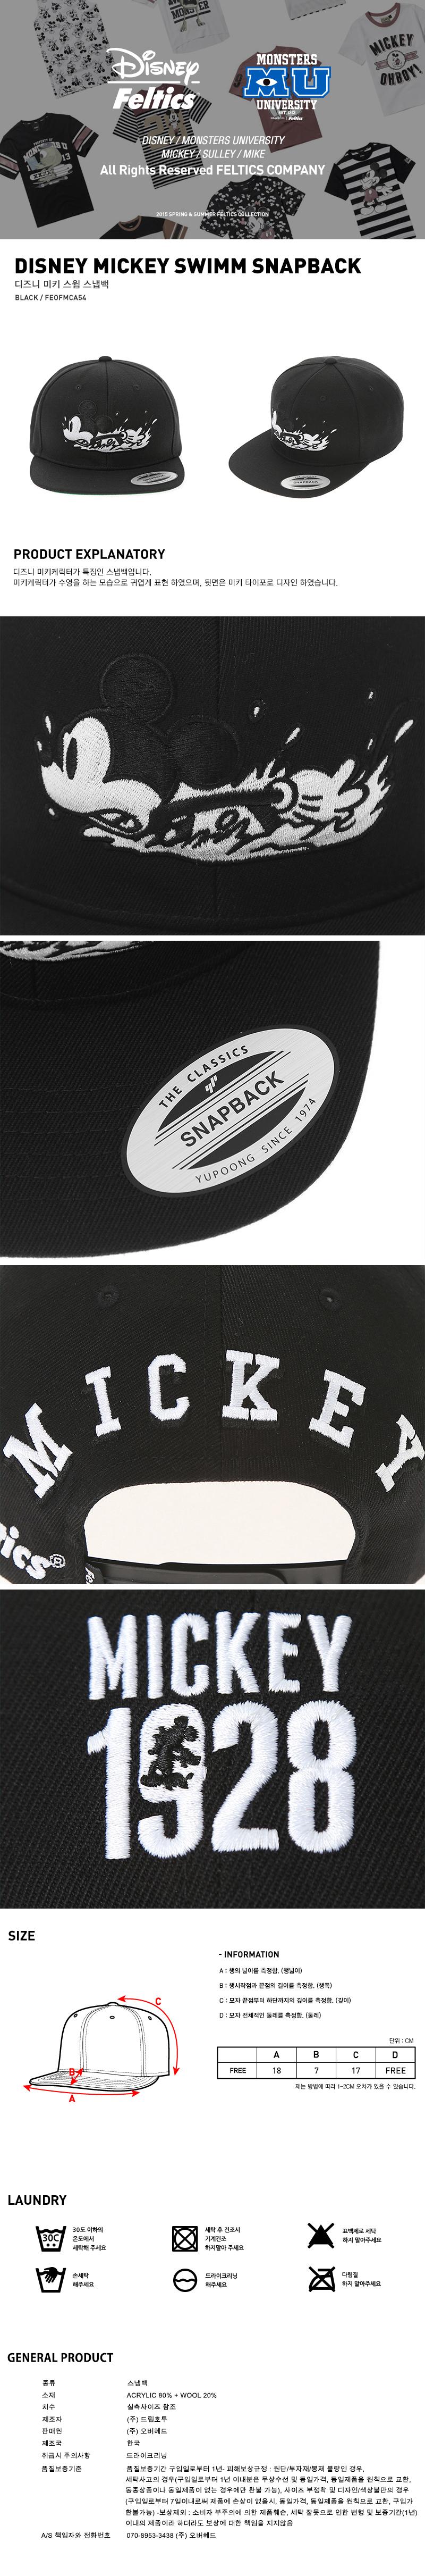 [ FELTICS ] [FELTICS] Disney Mickey Swimm SnapBack Black (FEOFMCA54)